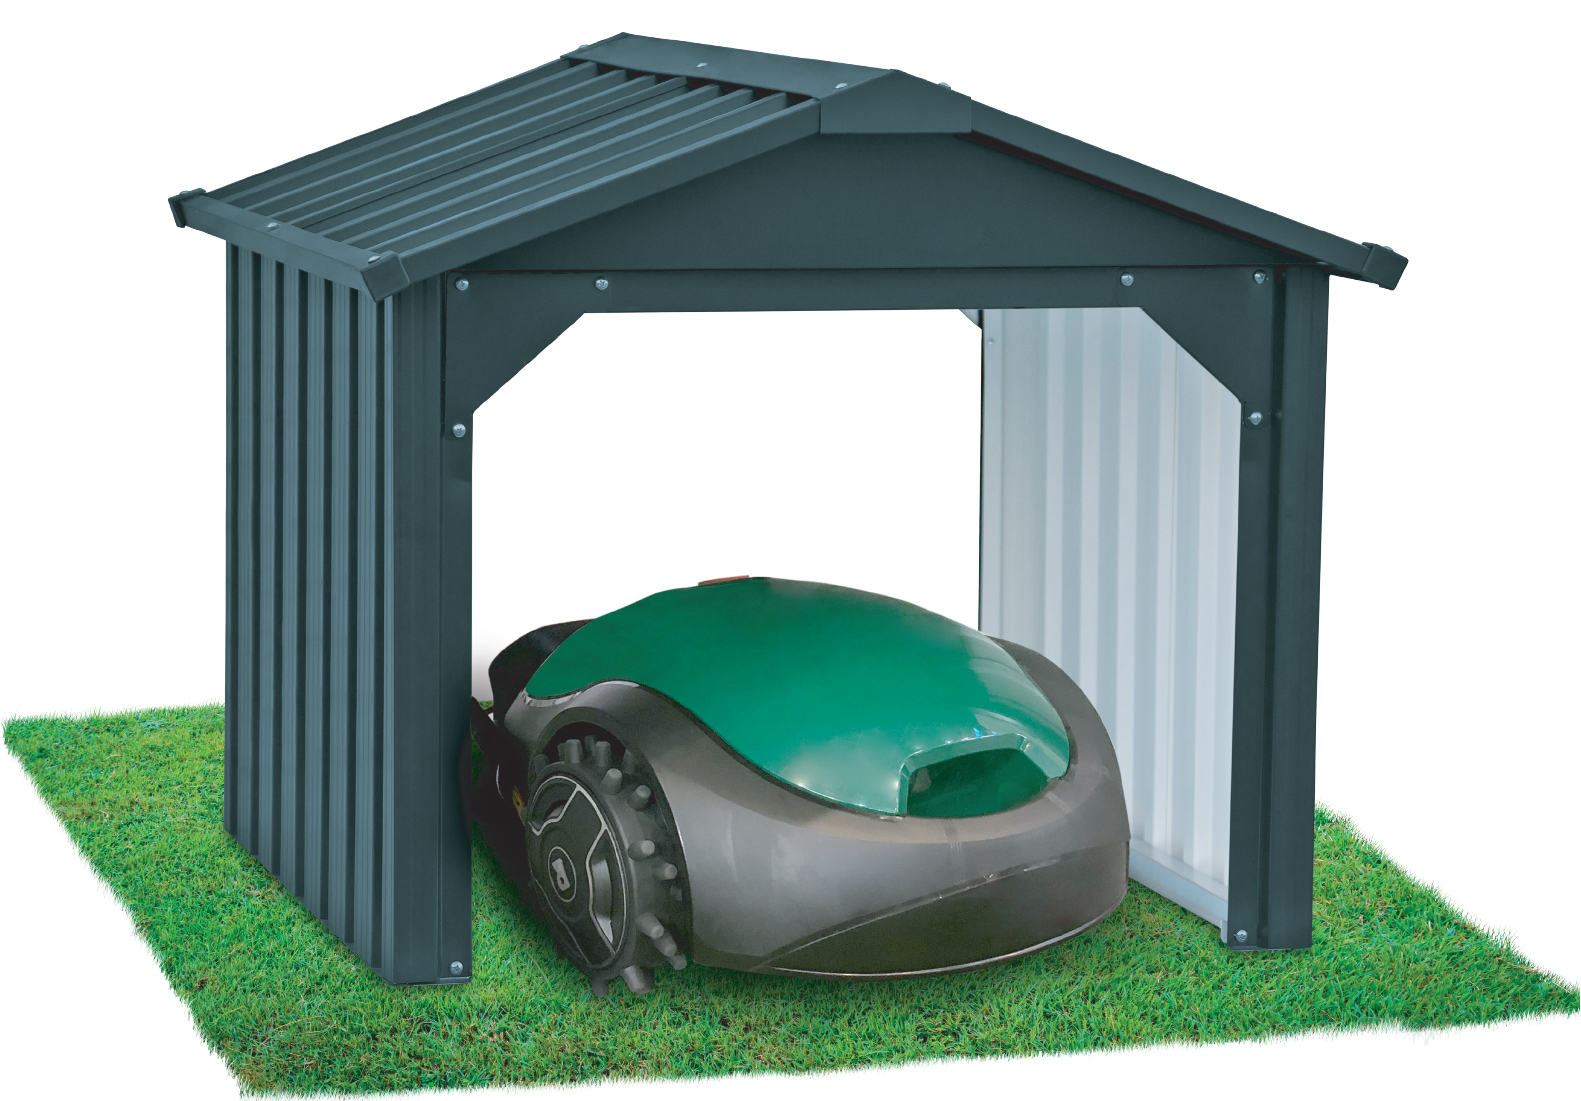 Robotic Lawn Mower open back – Duramax